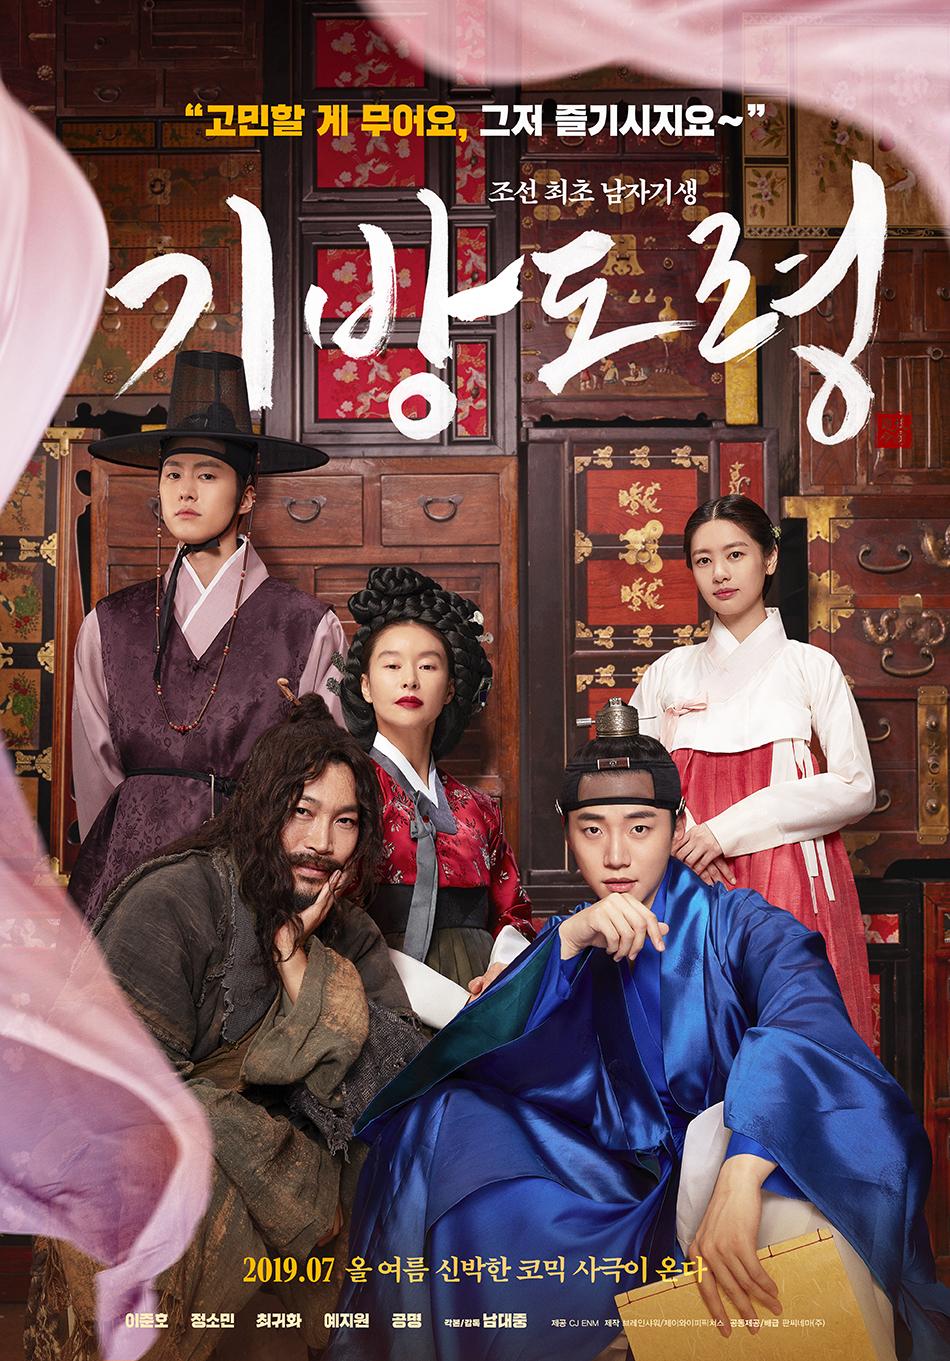 Sinopsis Homme Fatale (2019) - Film Korea